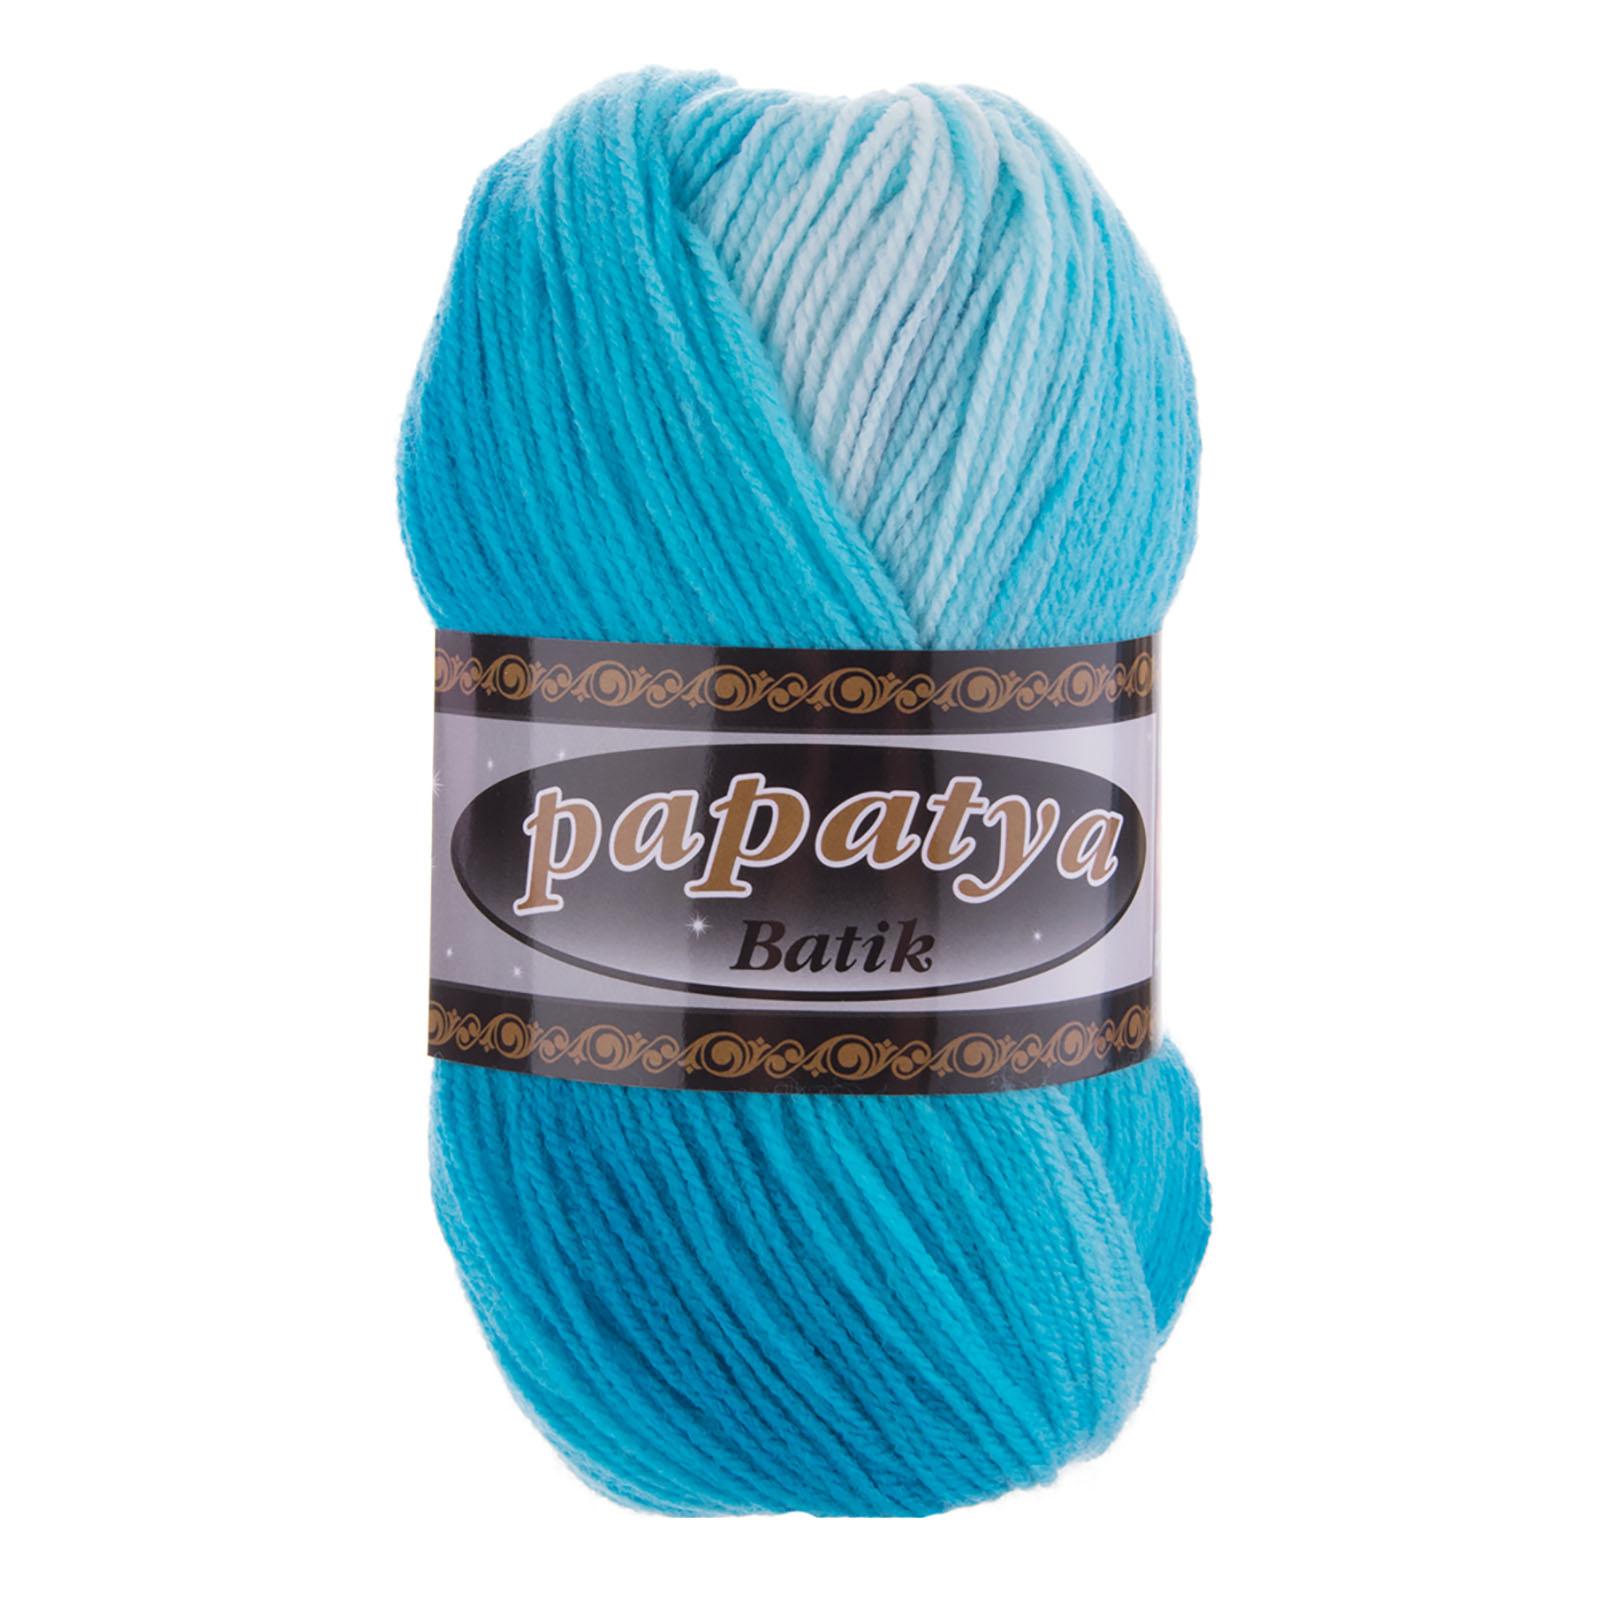 500g Farbverlaufsgarn Papatya Batik Strick-Wolle Strickgarn Häkelgarn Farbwahl – Bild 9